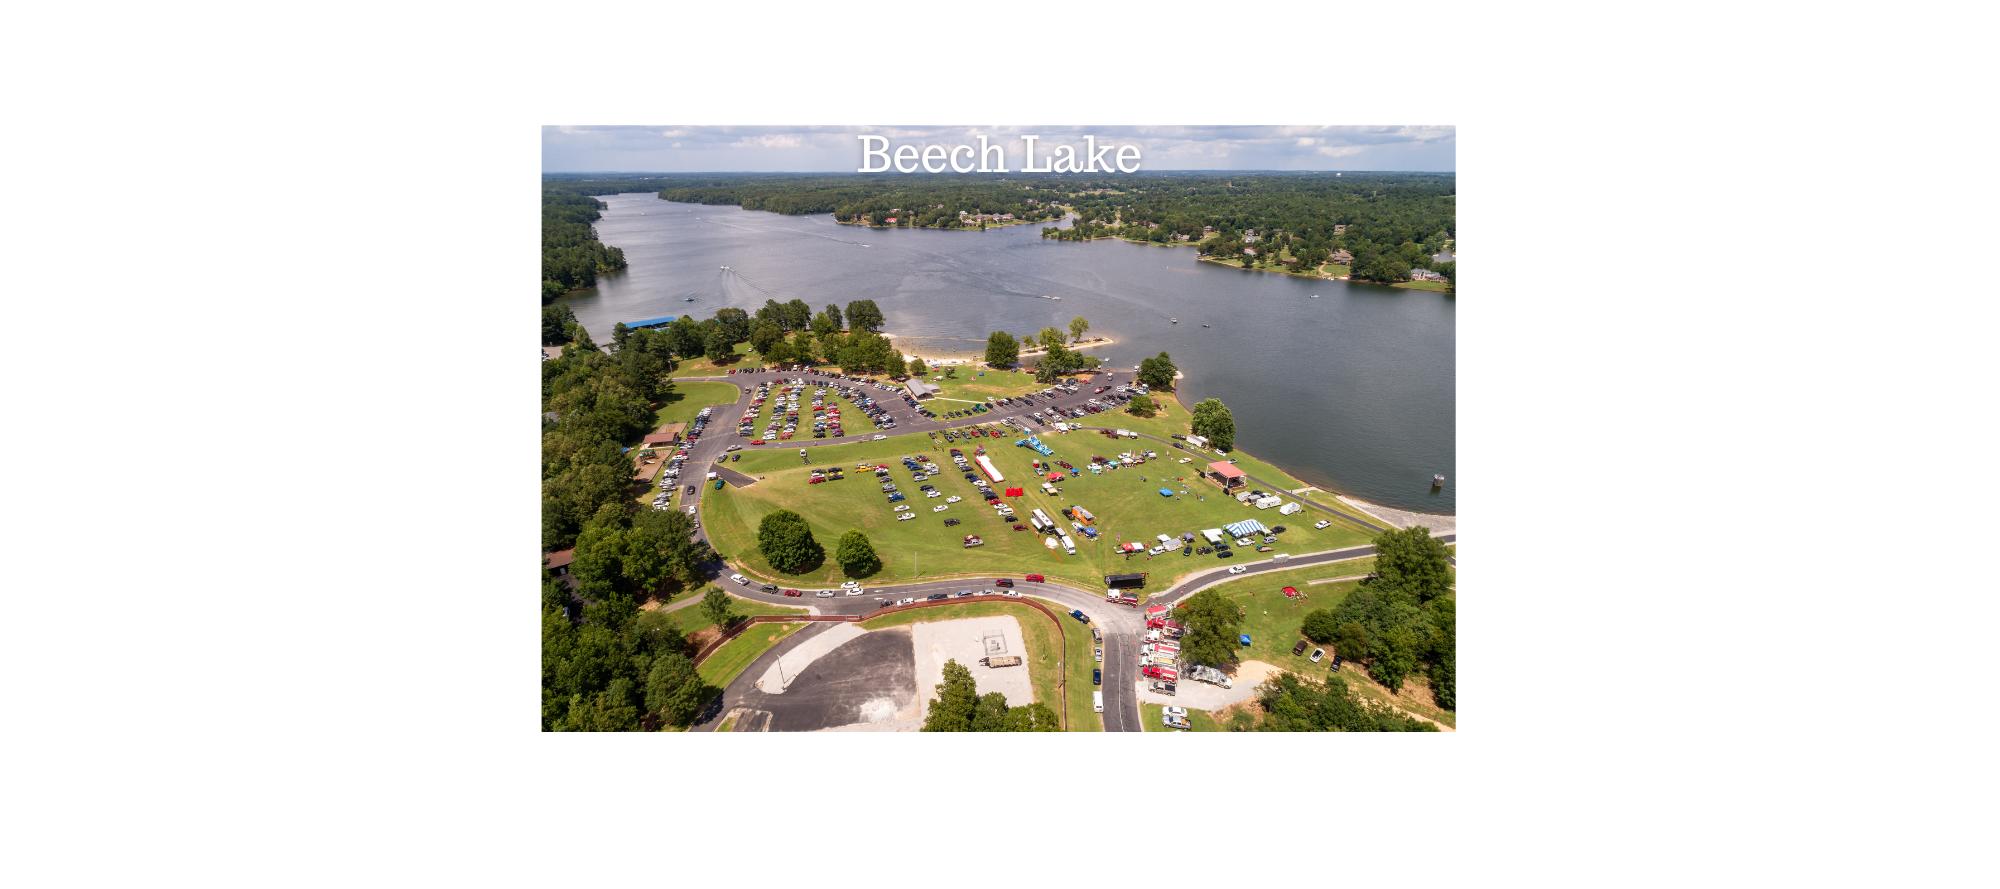 Beech Lake